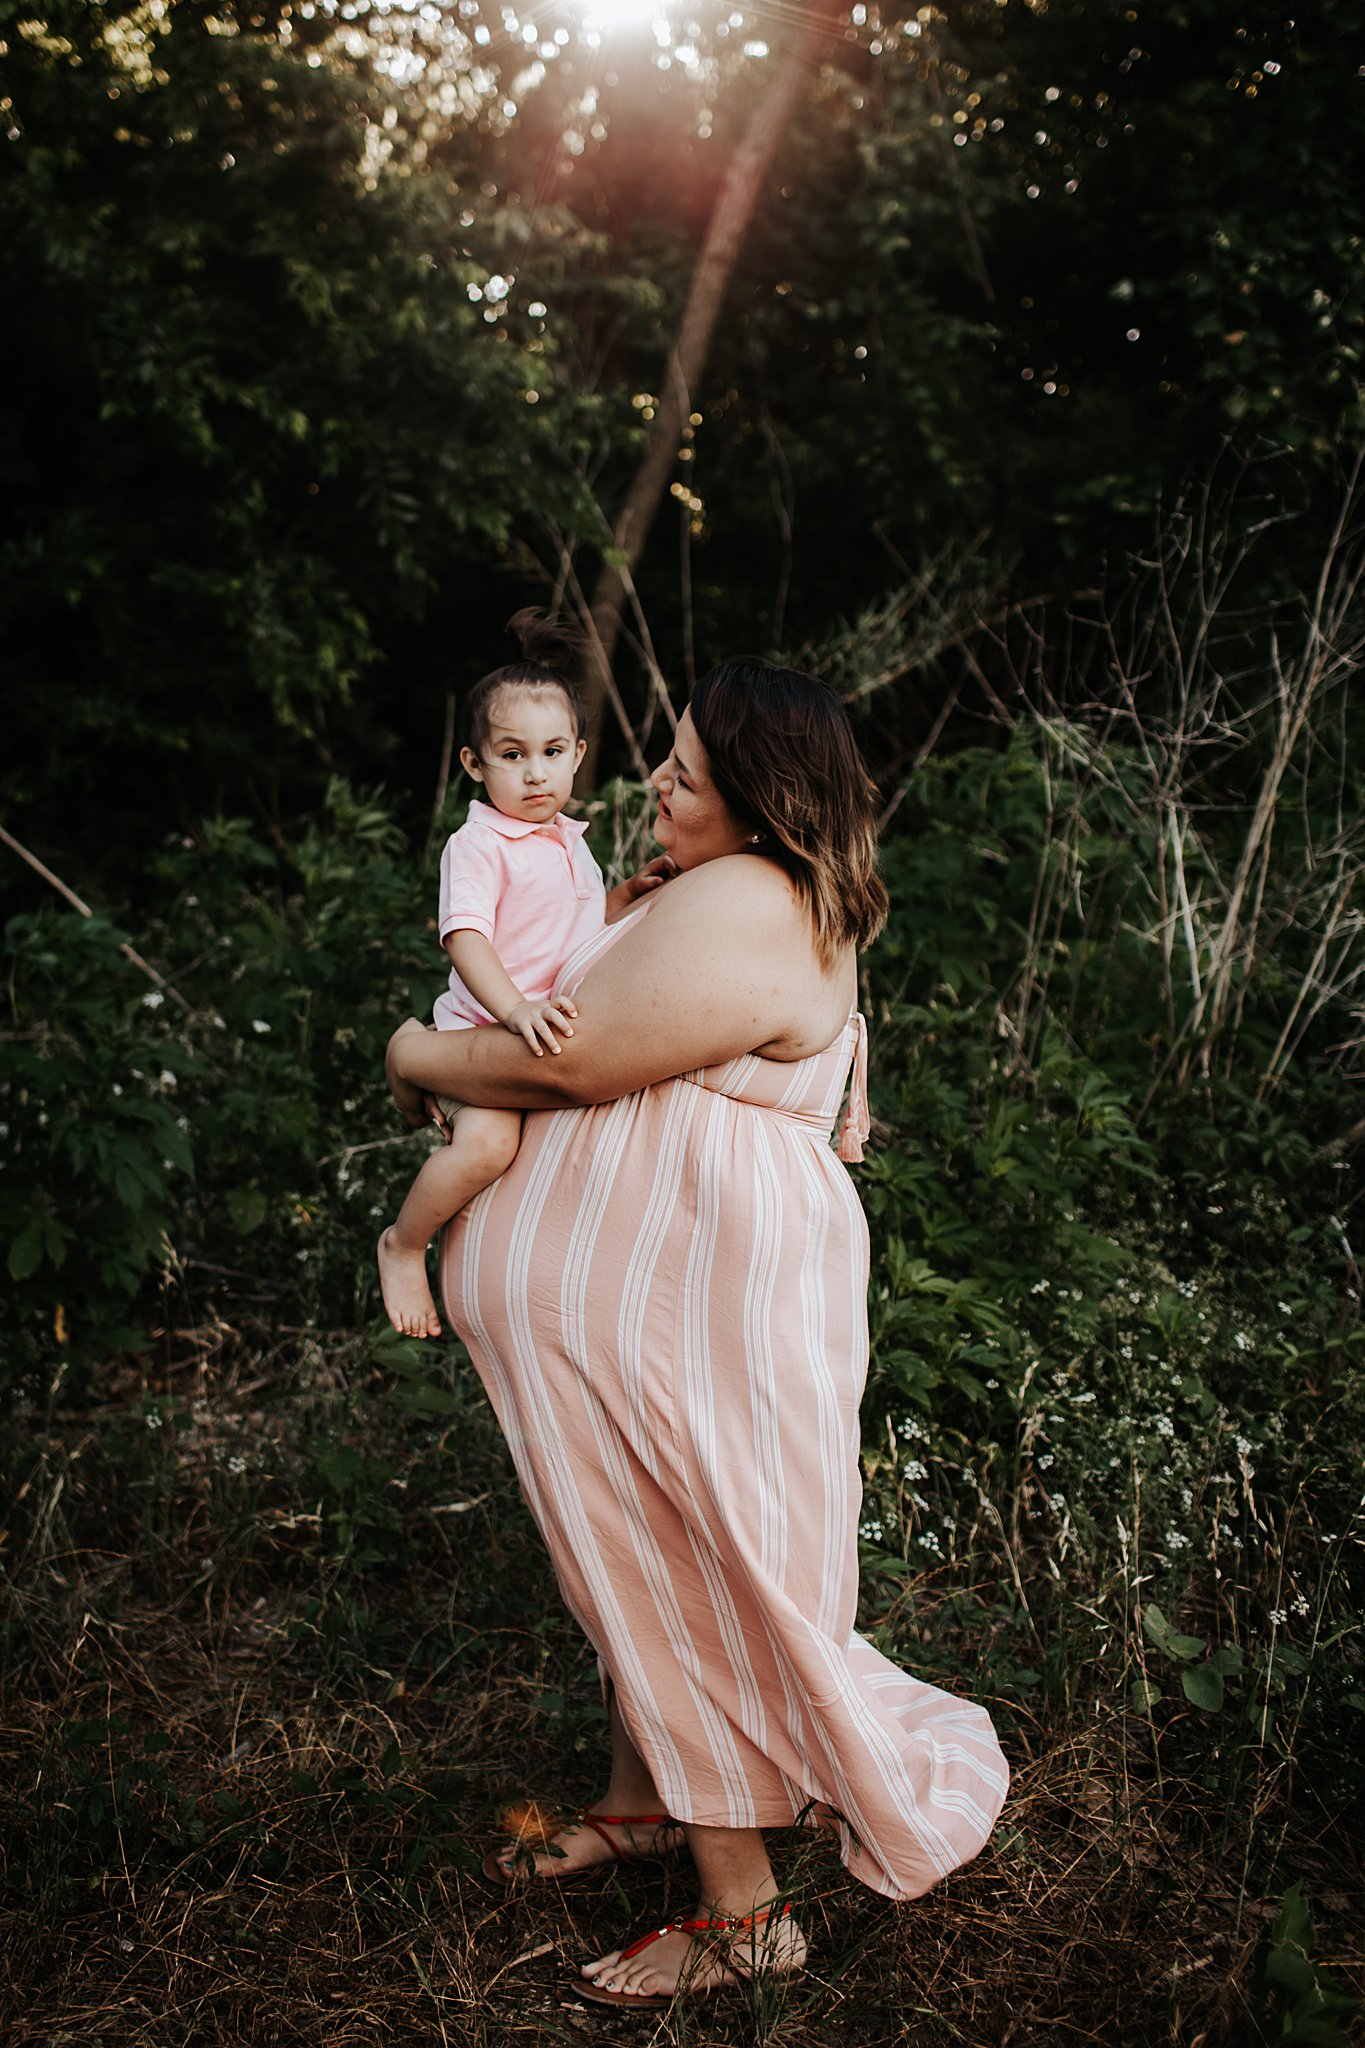 Vanny-San-Antonio-Maternity-Photographer-13_WEB.jpg